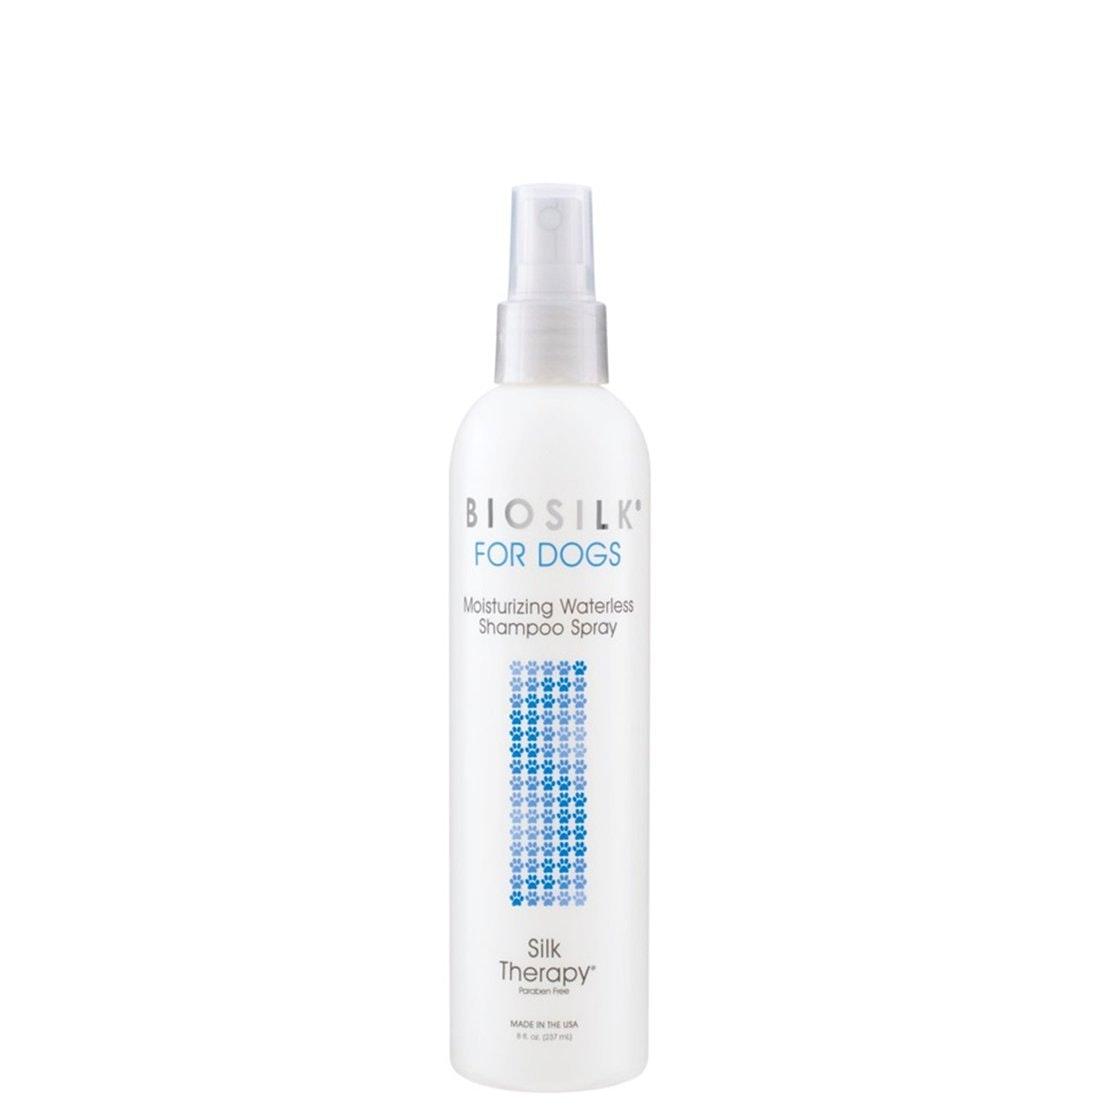 Biosilk Therapy Deep Moisture Waterless Dog Shampoo Spray